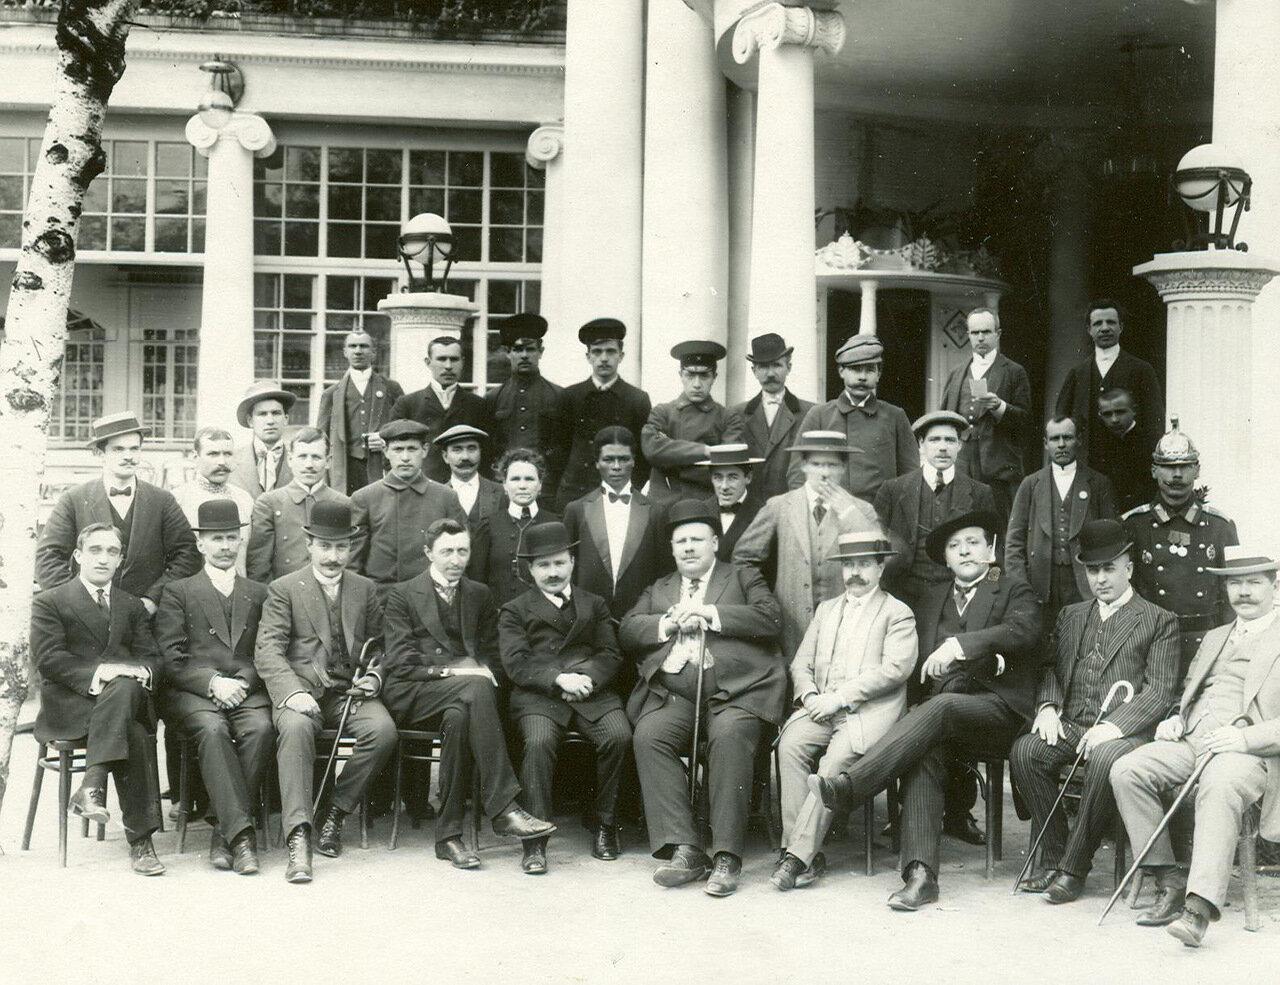 Группа владельцев и сотрудников ресторана «Луна-парк»